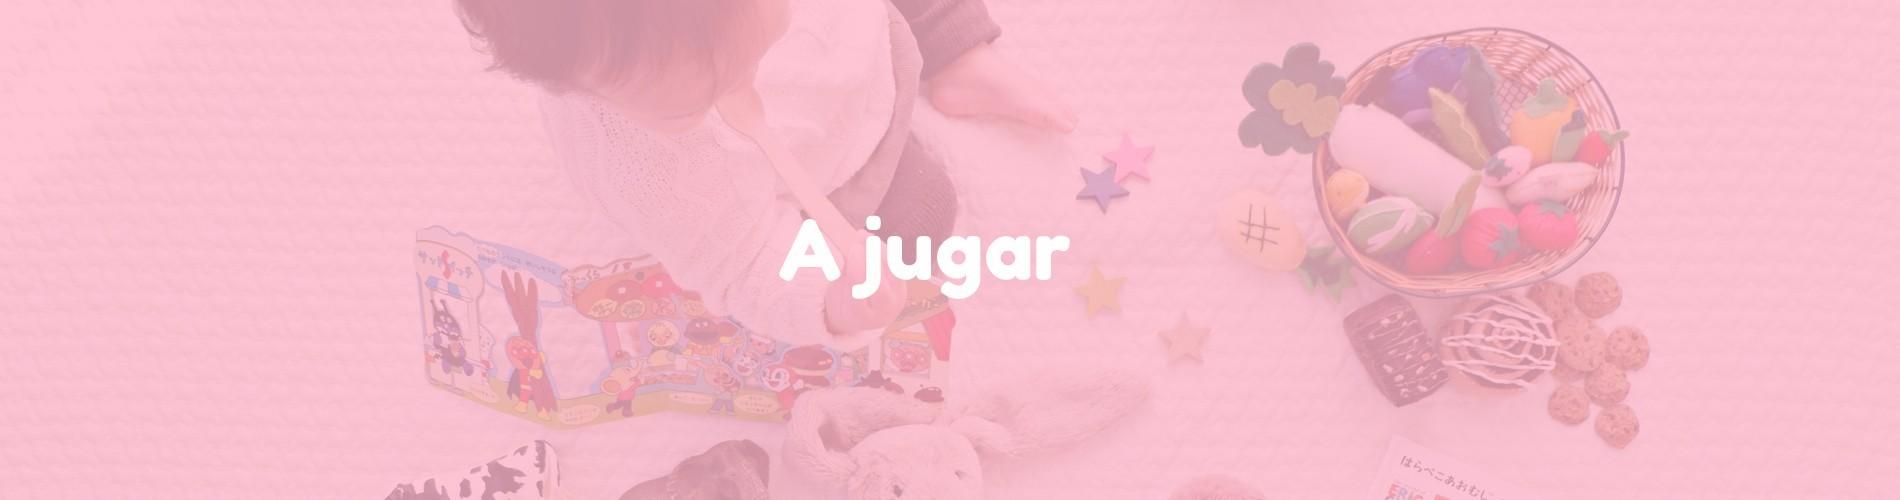 Brinquedos e Presentes | Loja Online Bebês | A la Nanita Nana